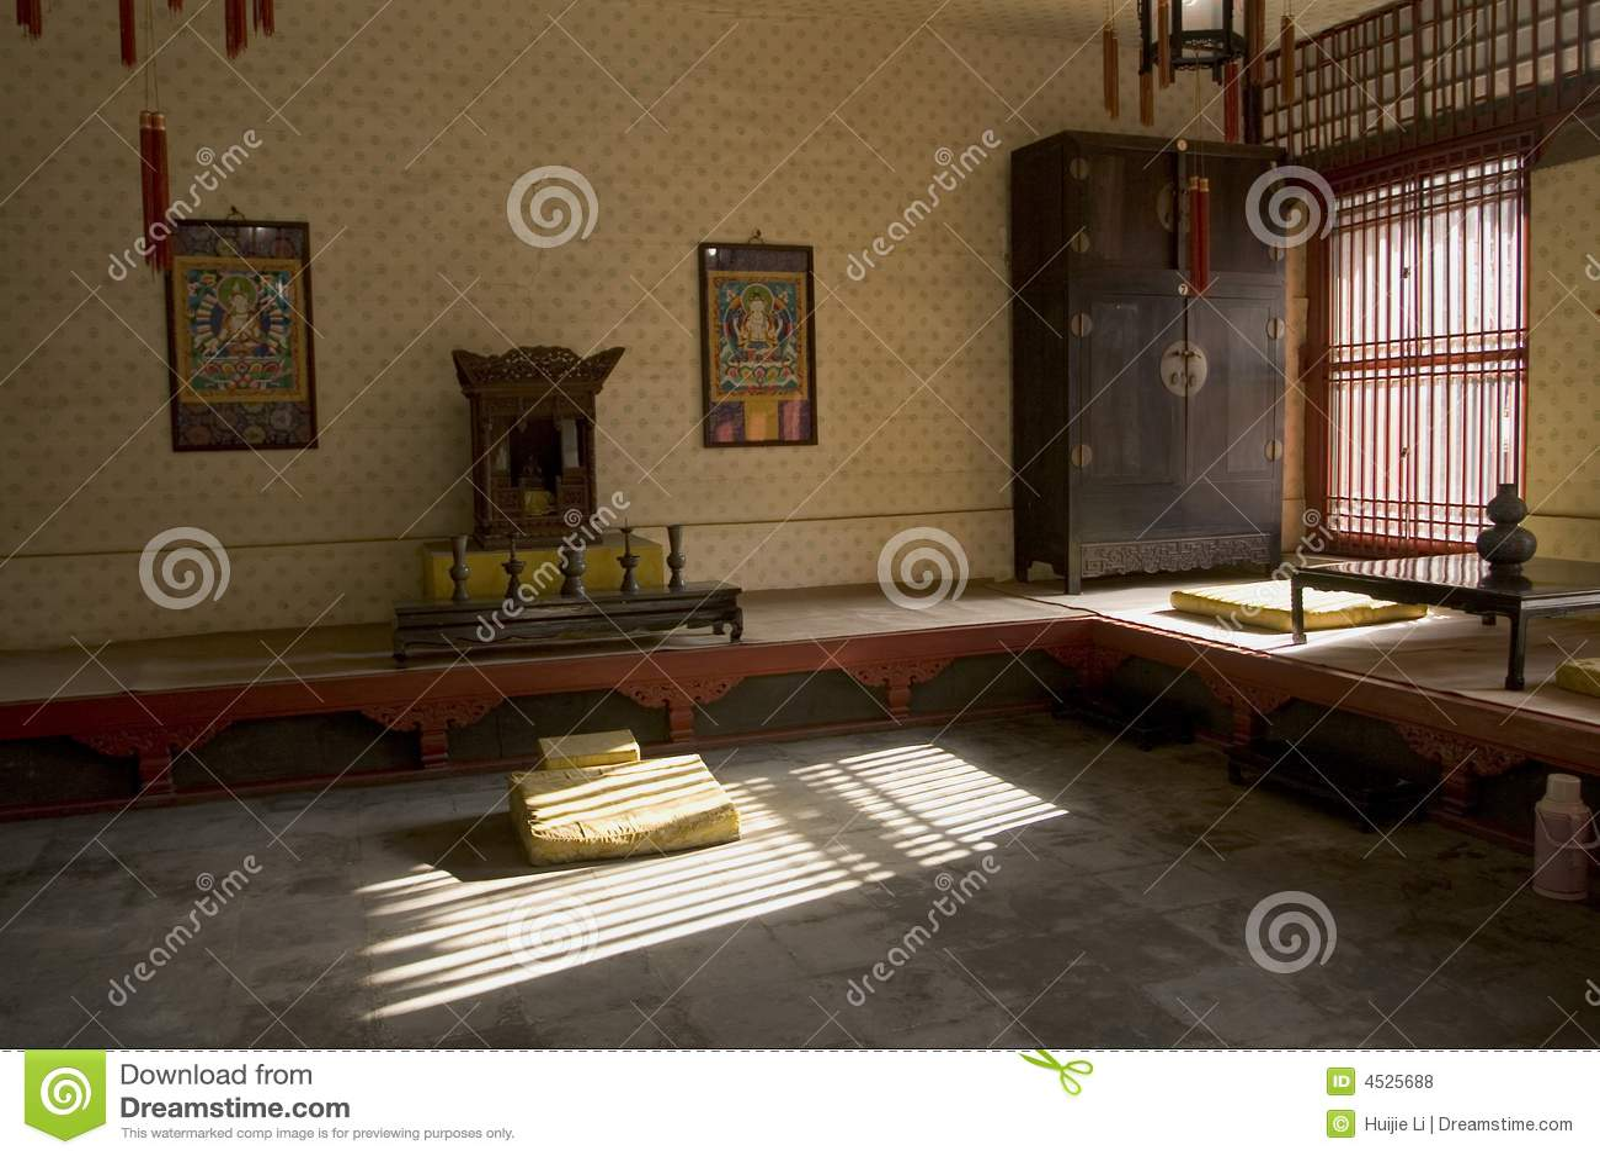 Imperial palace shenyang